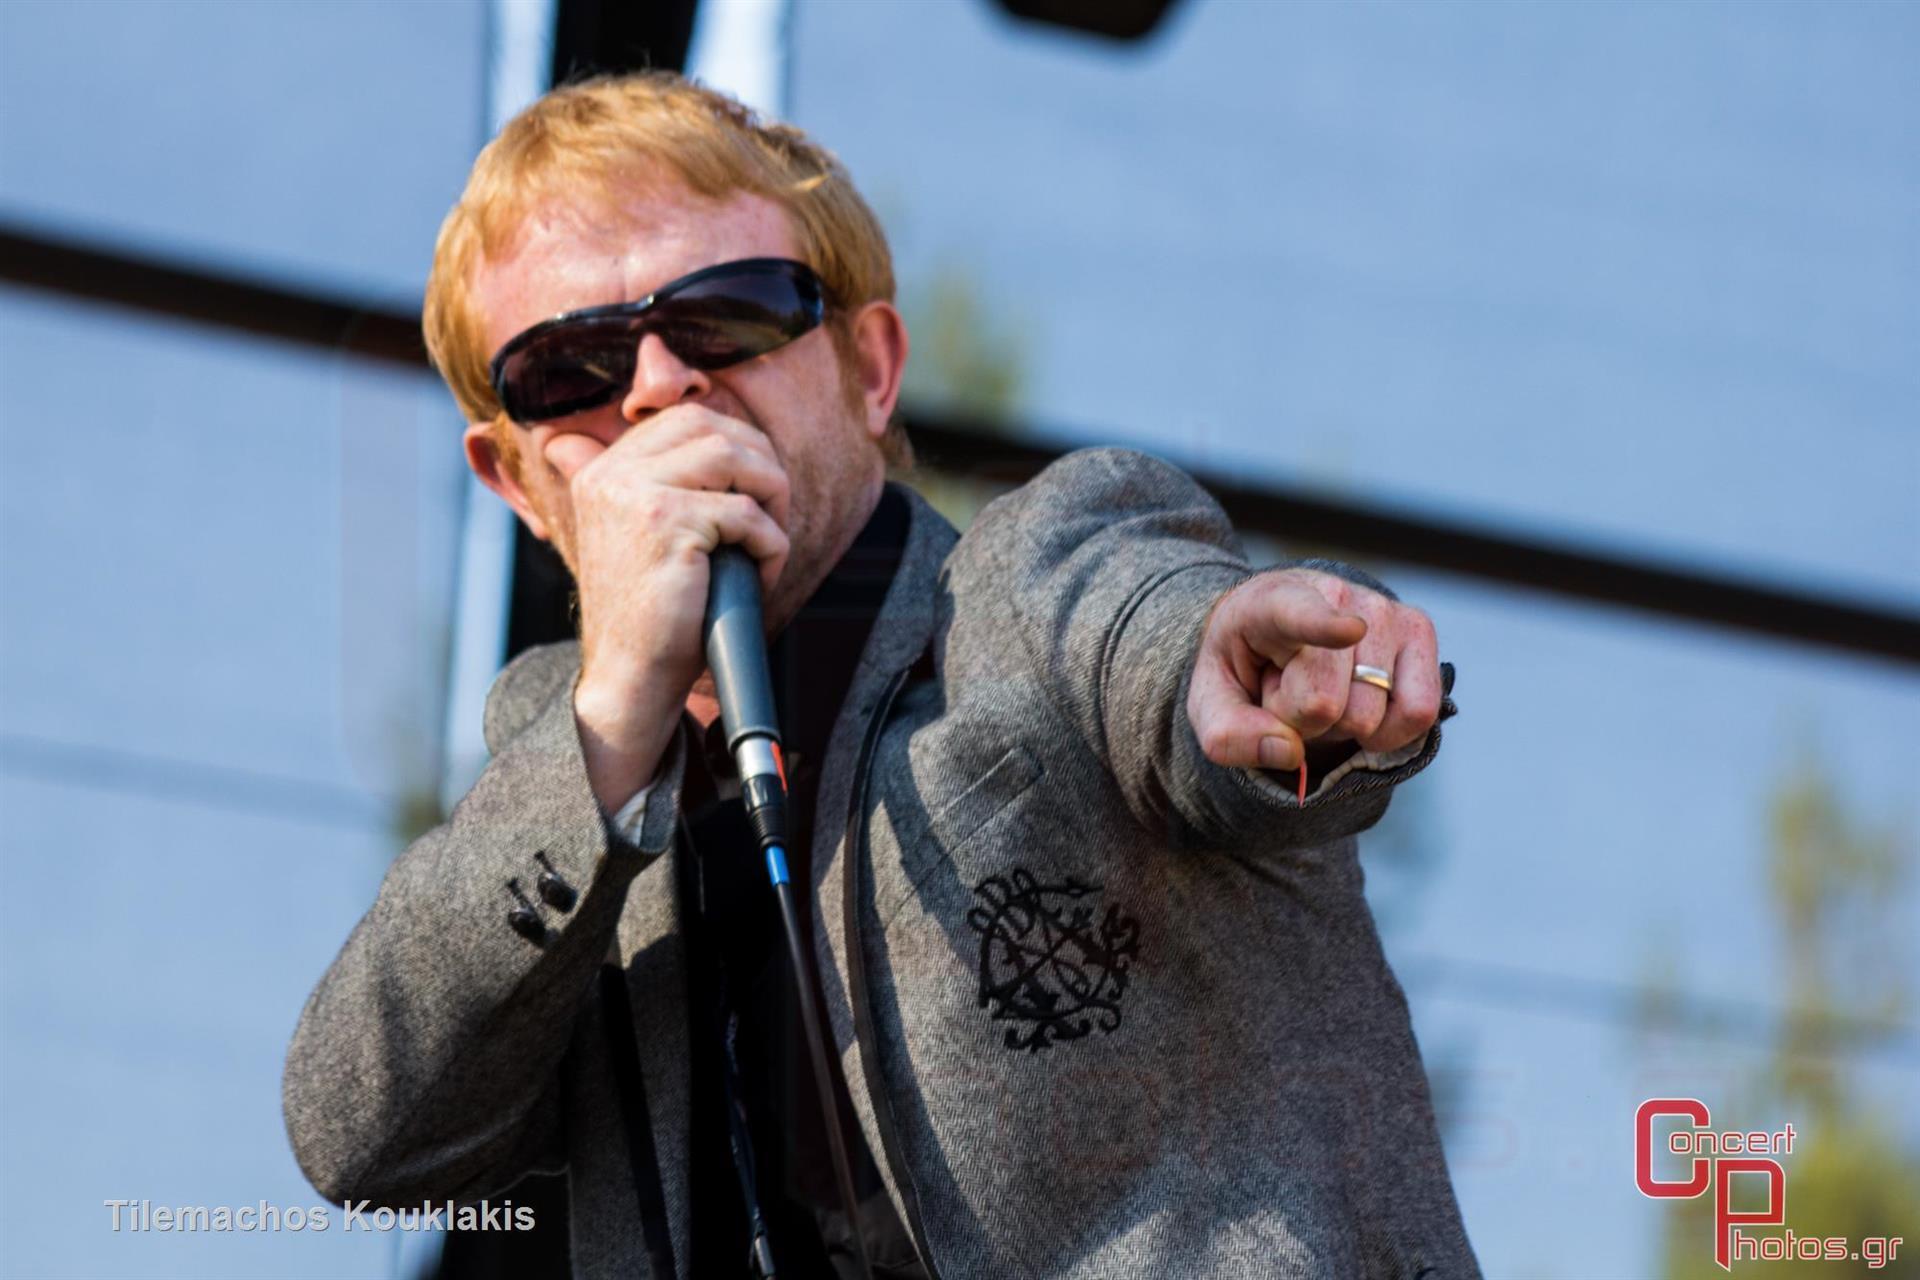 Craig Walker-Craig Walker photographer: Tilemachos Kouklakis - concertphotos_-0432